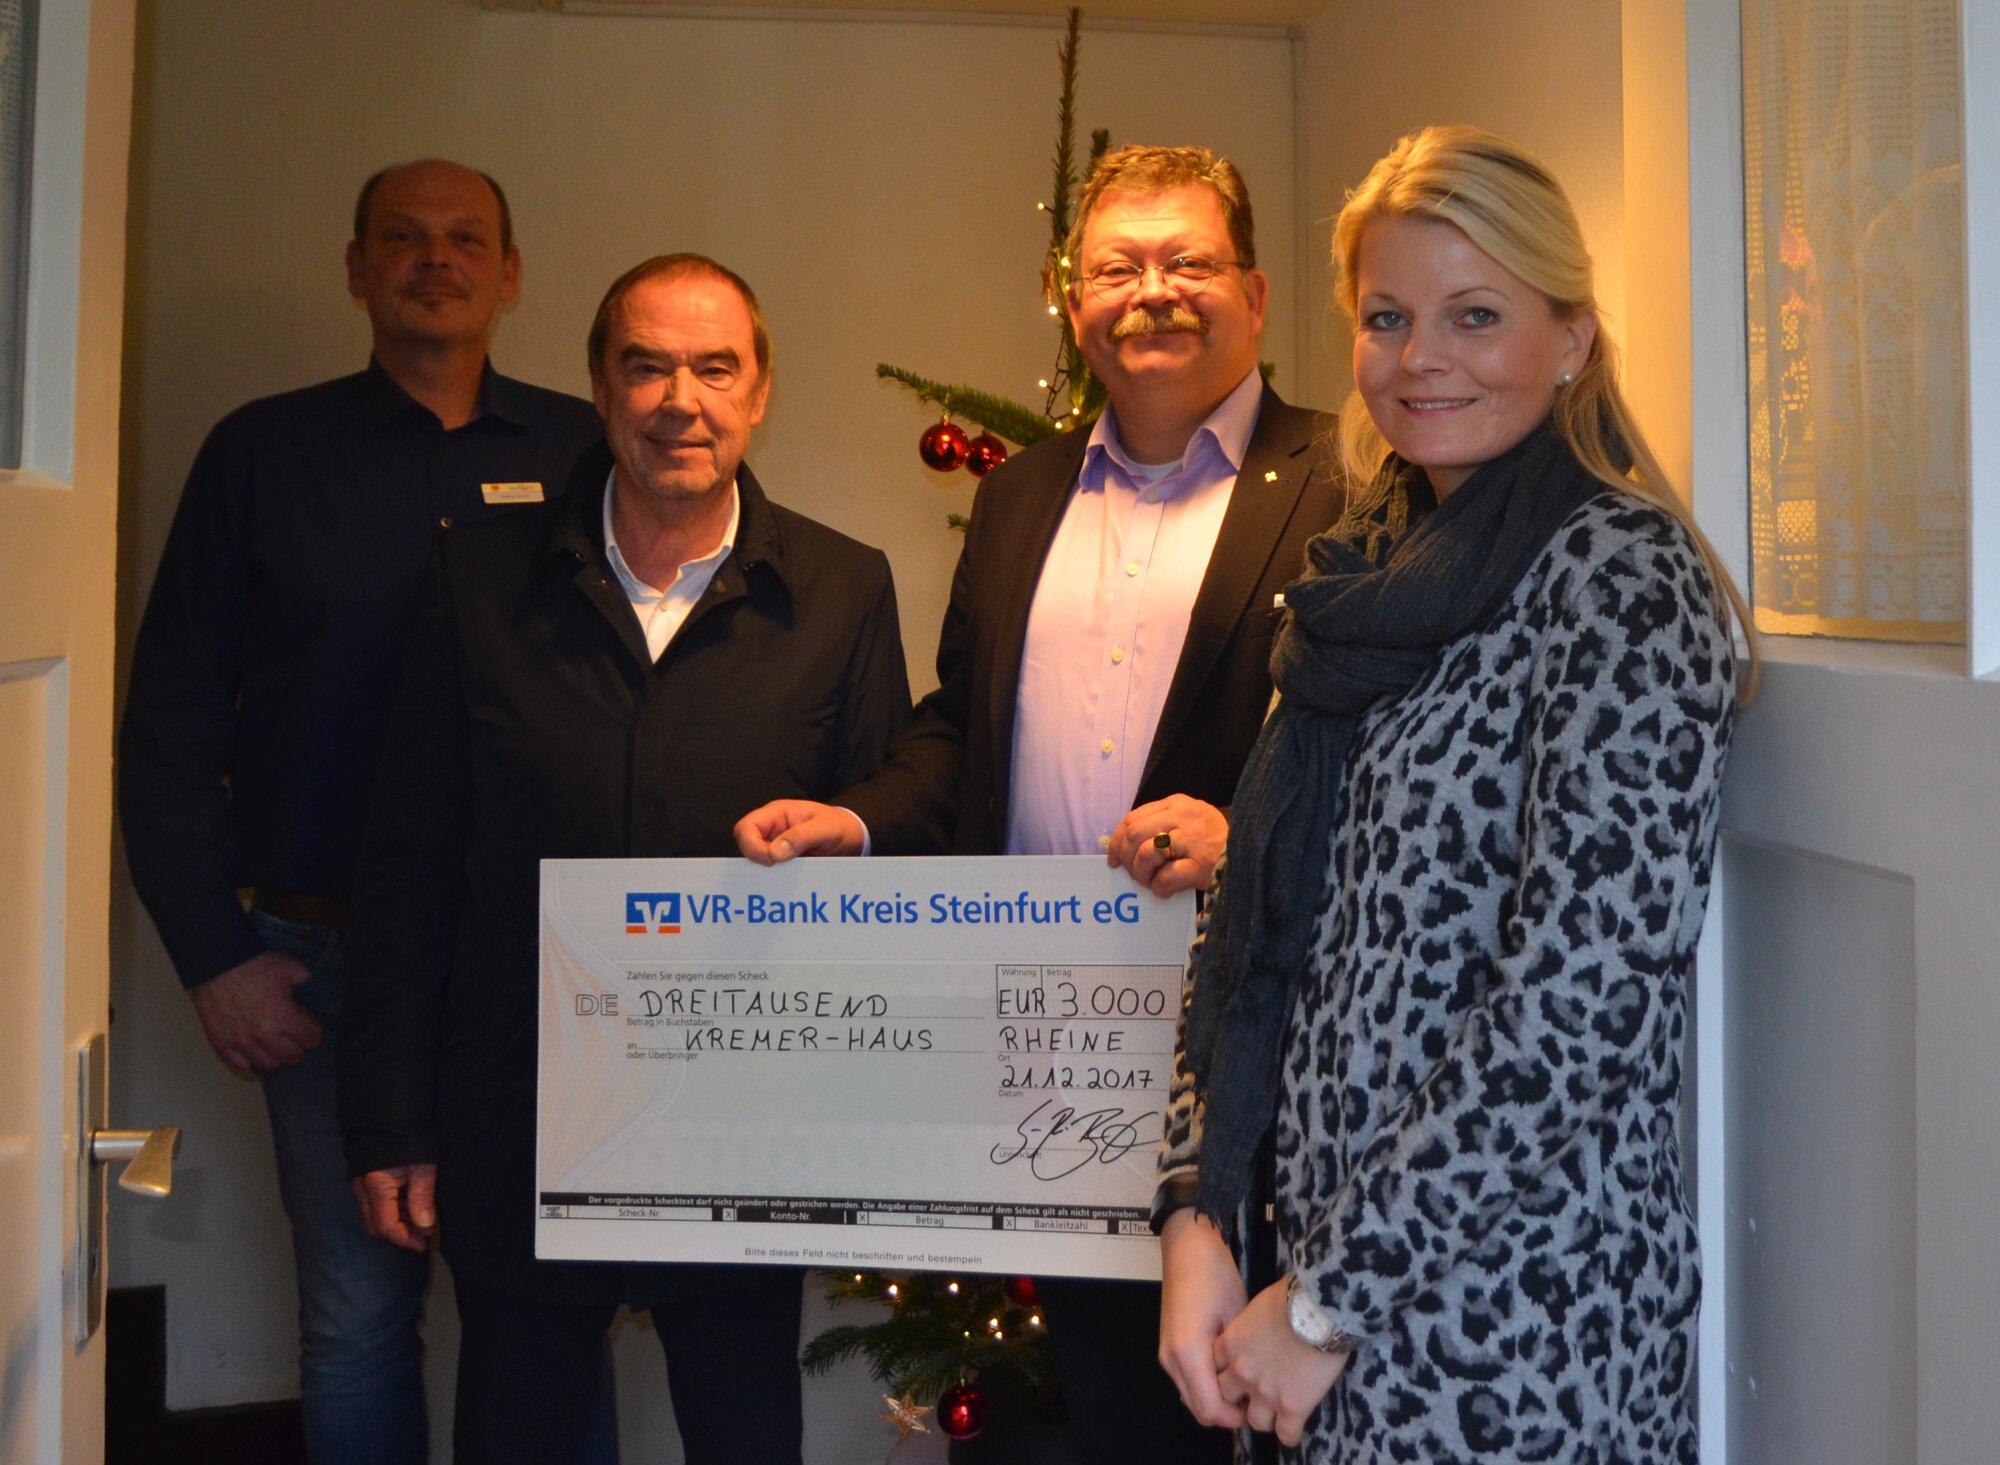 Spendenübergabe Kremerhaus Dezember 2017